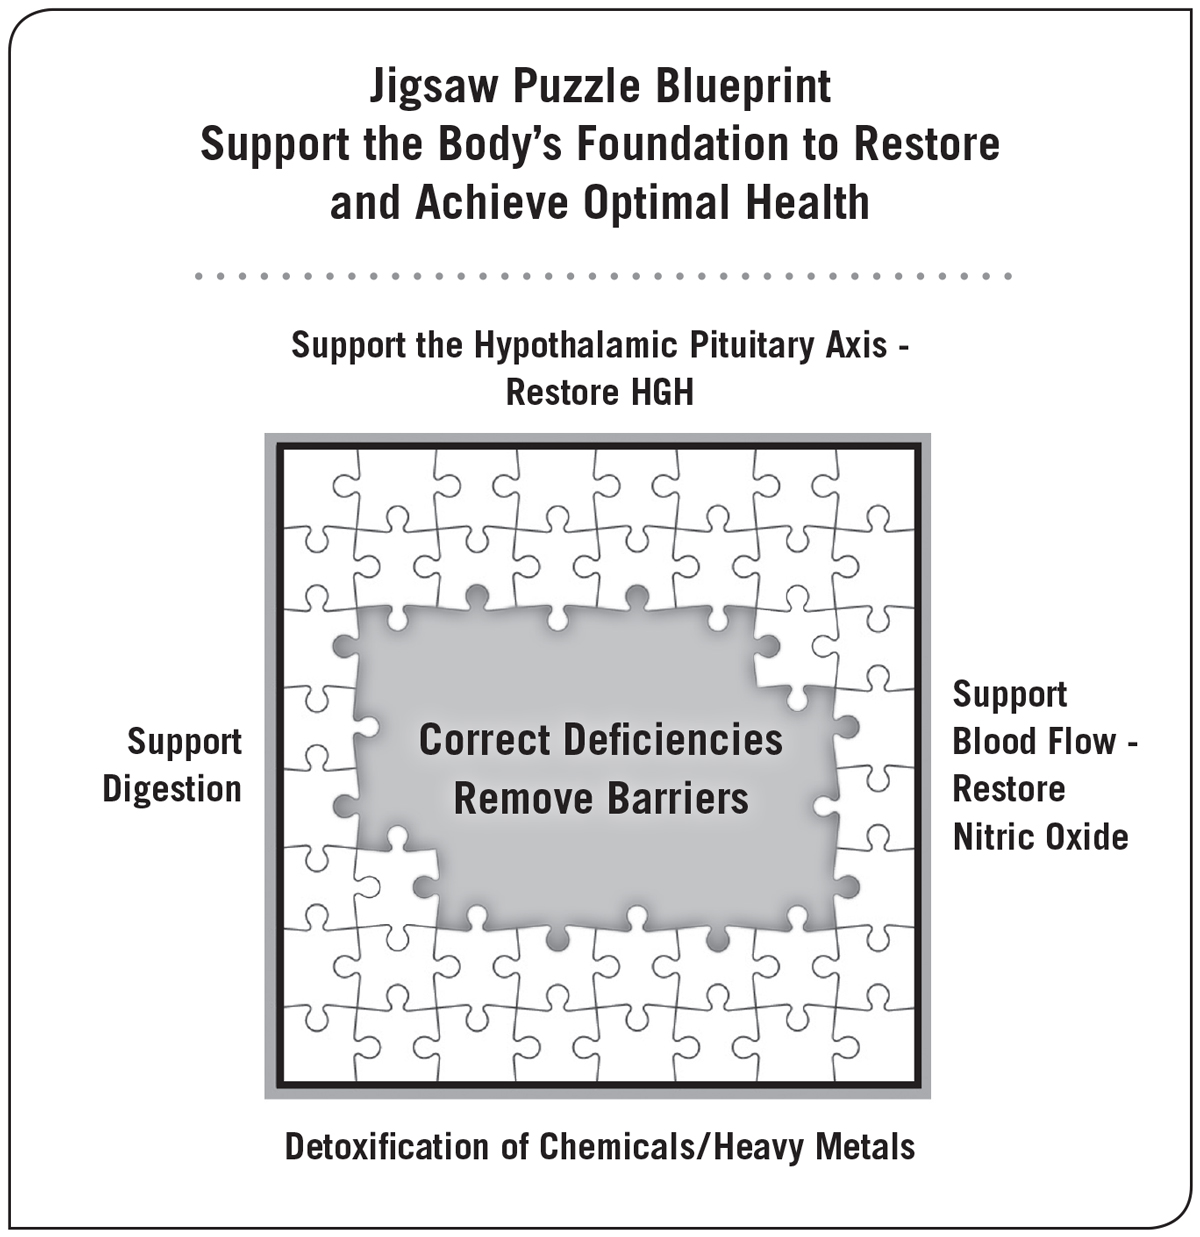 IMS-PuzzleBlueprint-800.jpg